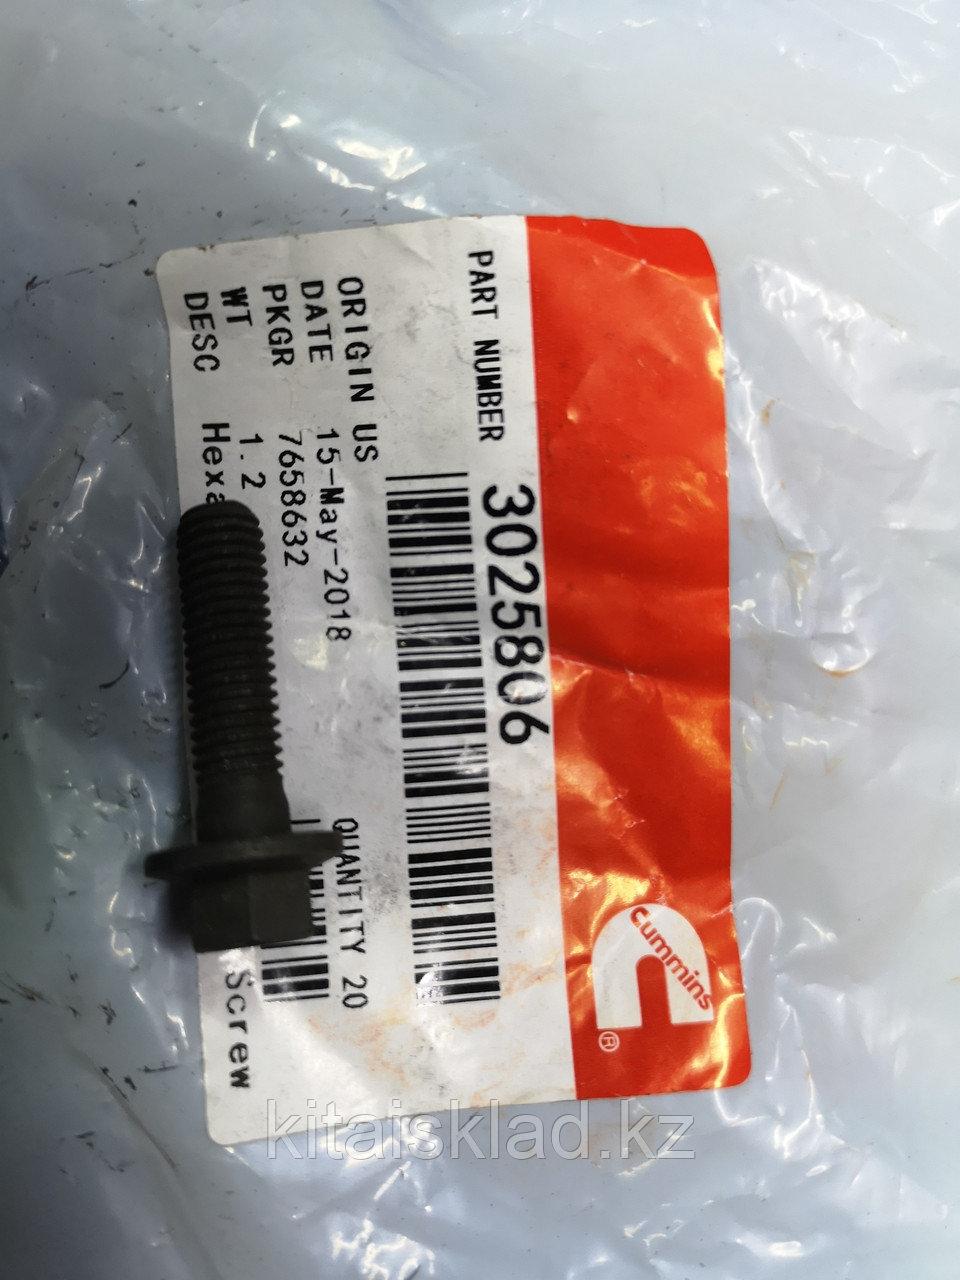 Болт 3025806 крепления масляной трубки Cummins ISF, ISBe